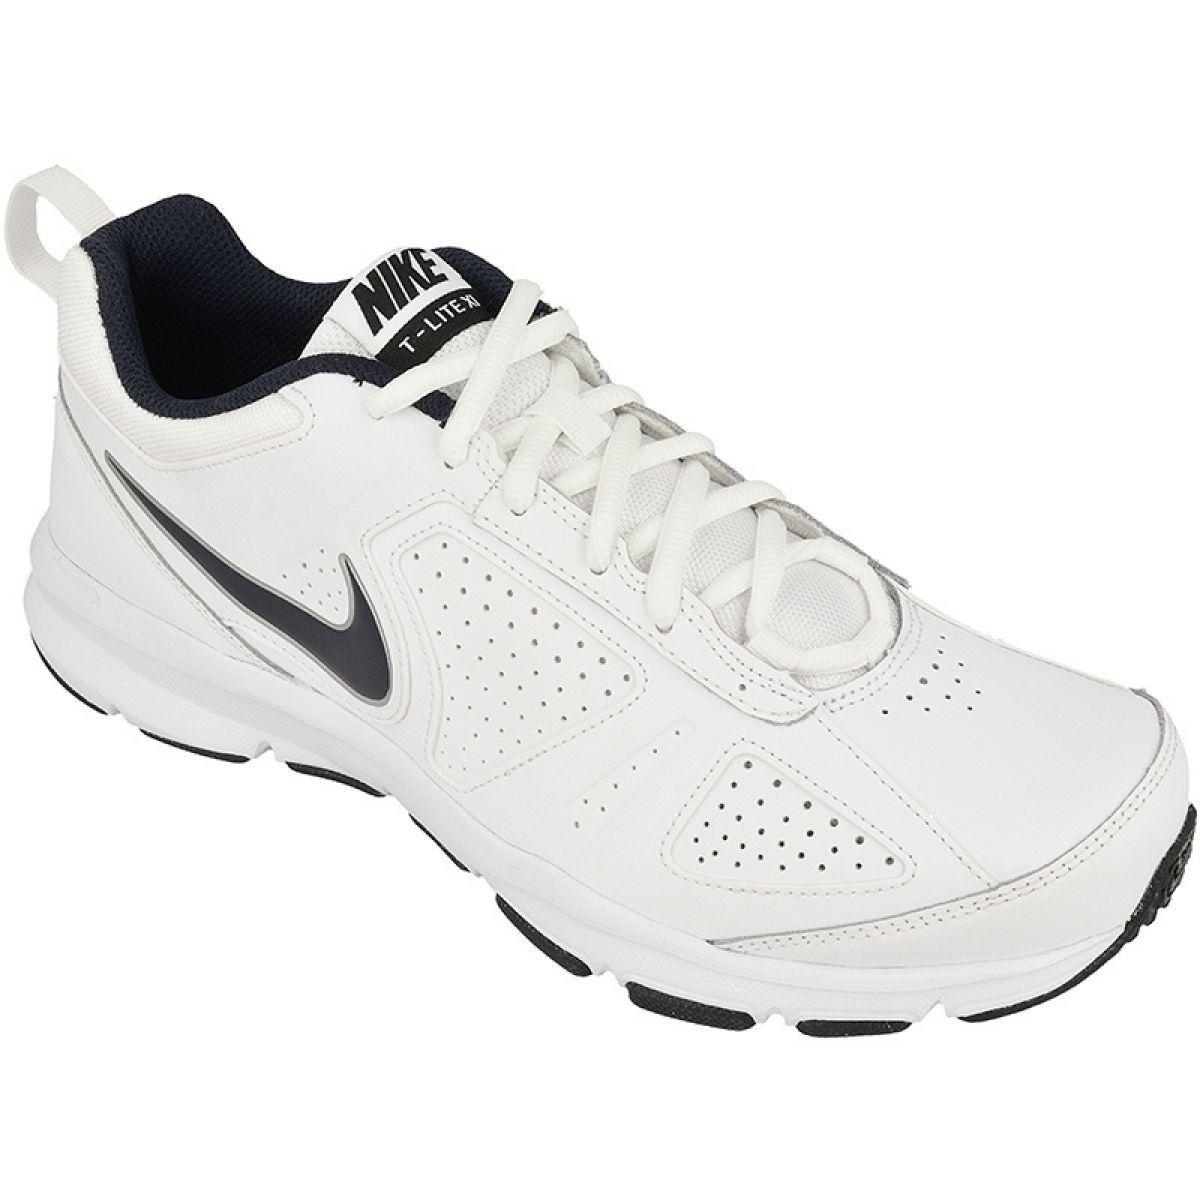 Buty Treningowe Nike T Lite Xi M 616544 101 Biale Nike Training Shoes Training Shoes Mens Nike Shoes